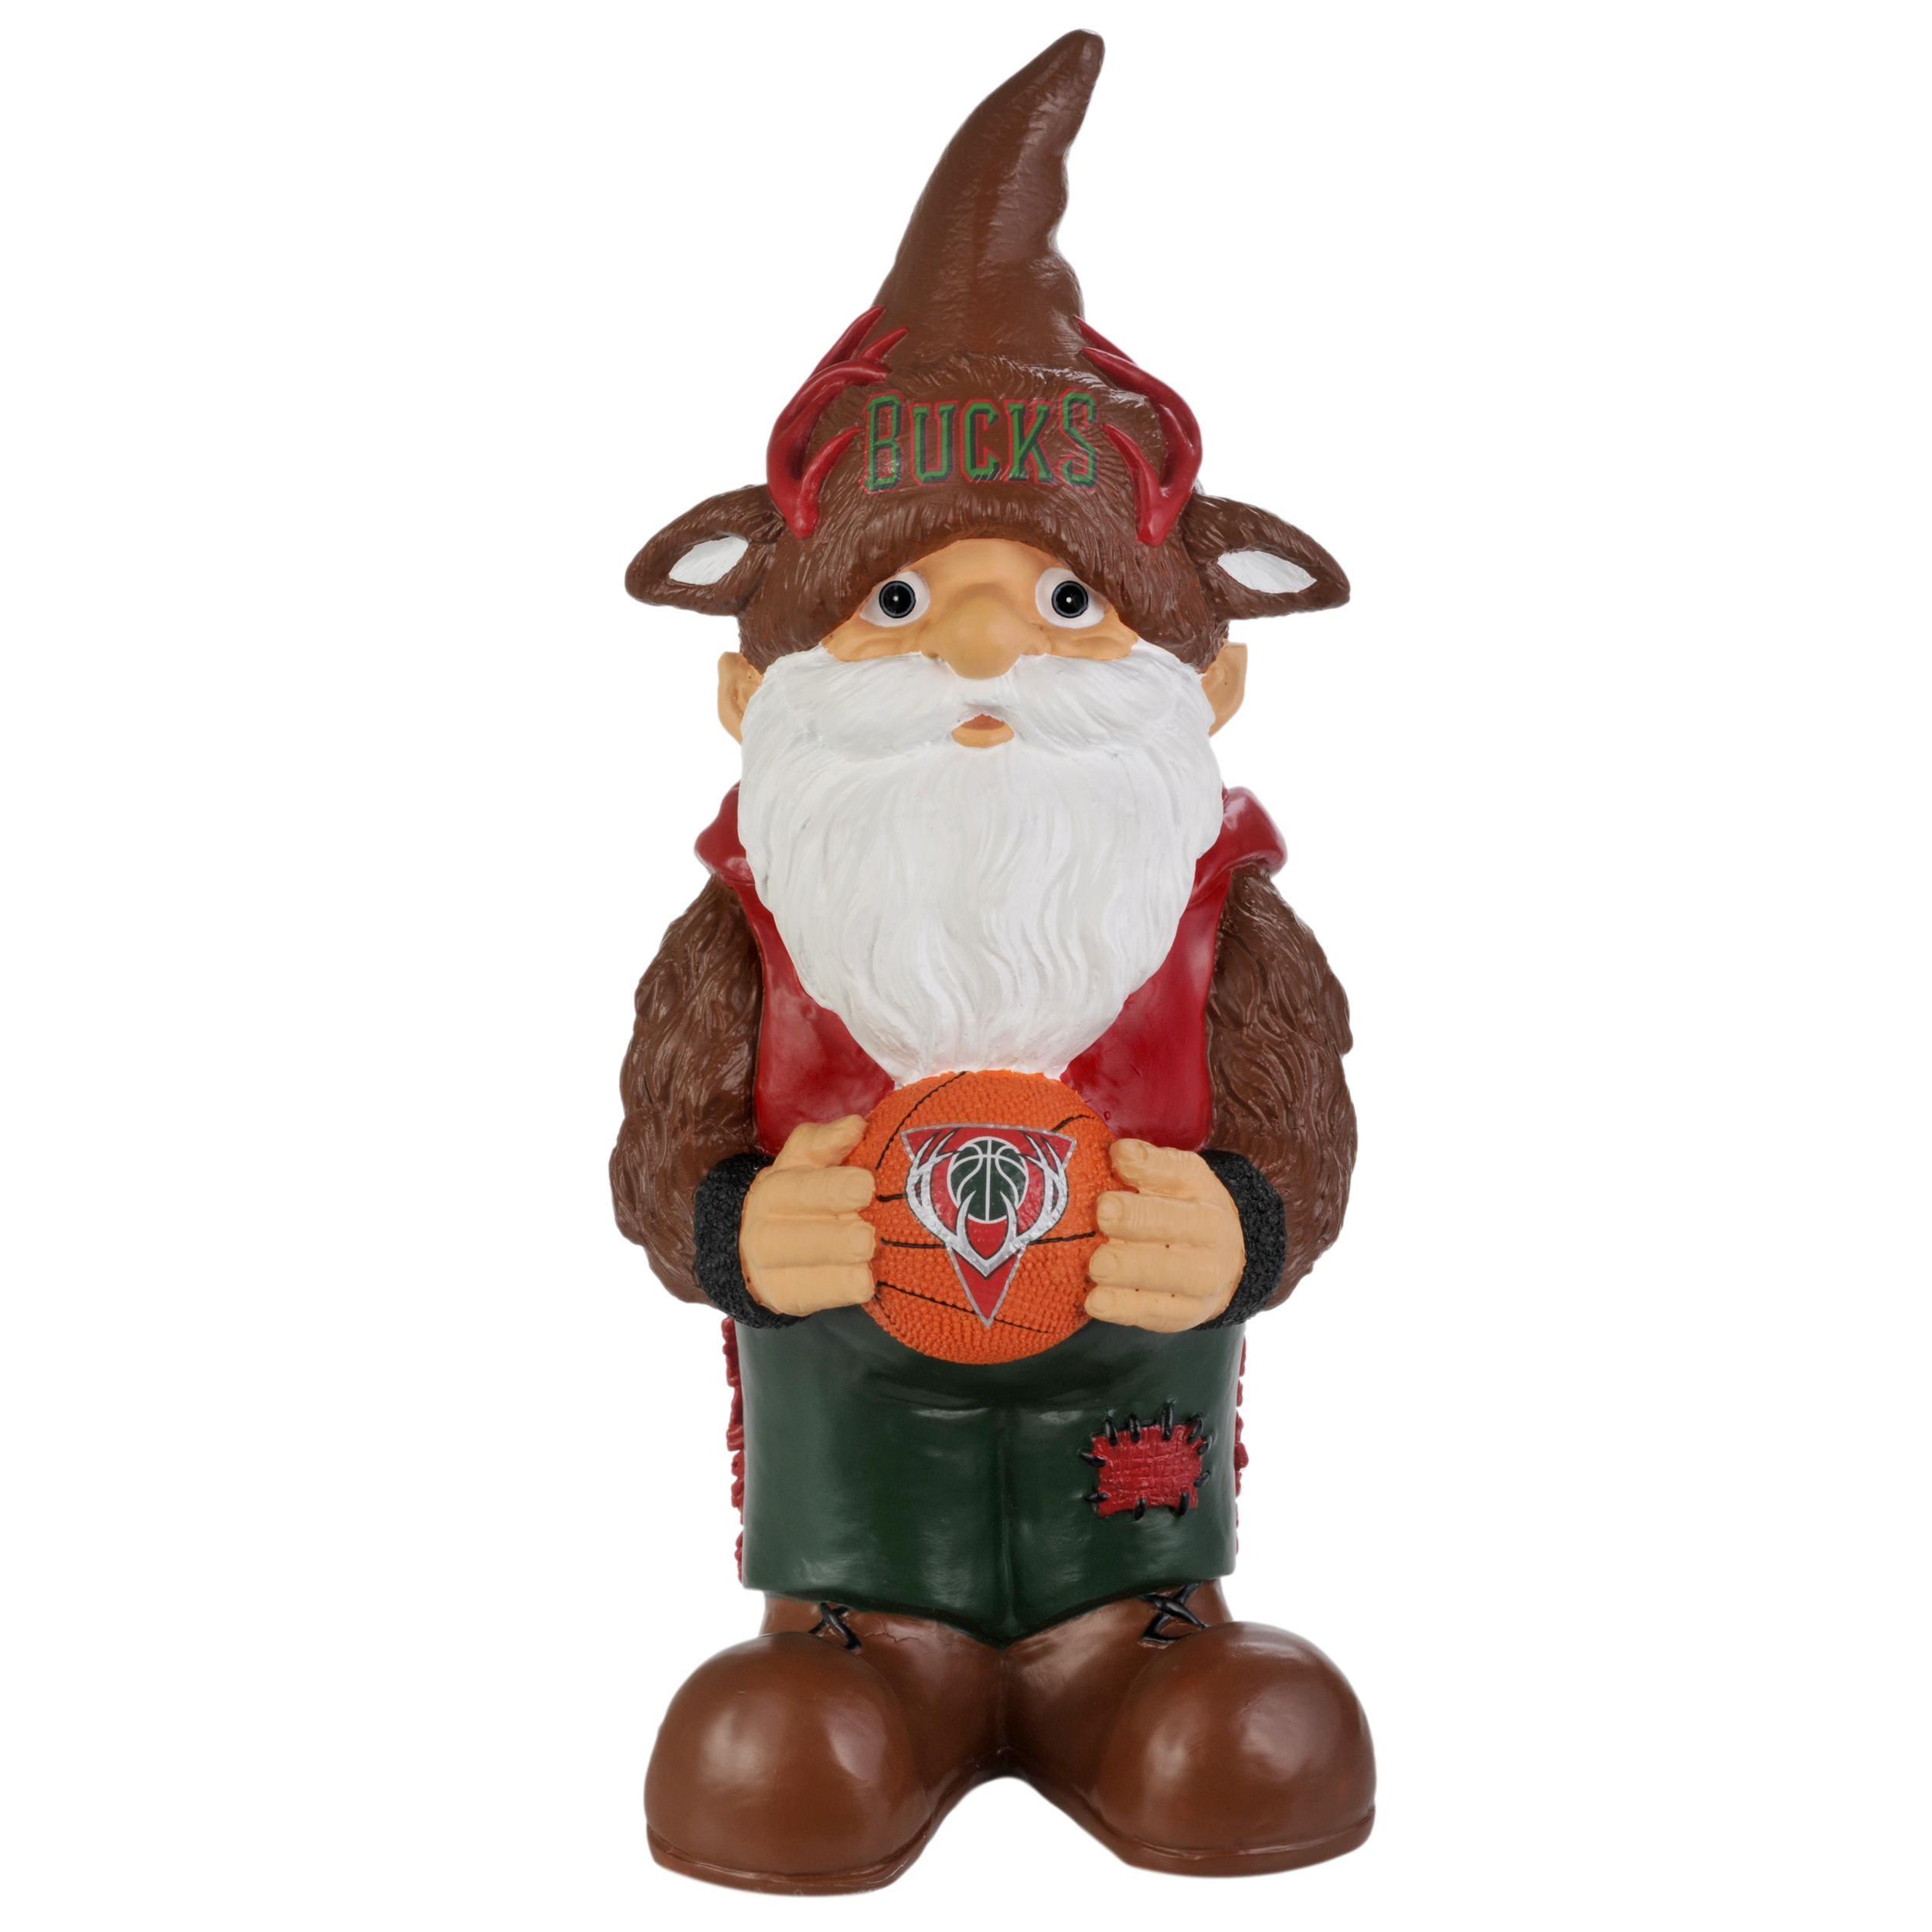 Milwaukee Bucks 11-inch Thematic Garden Gnome - Thumbnail 2